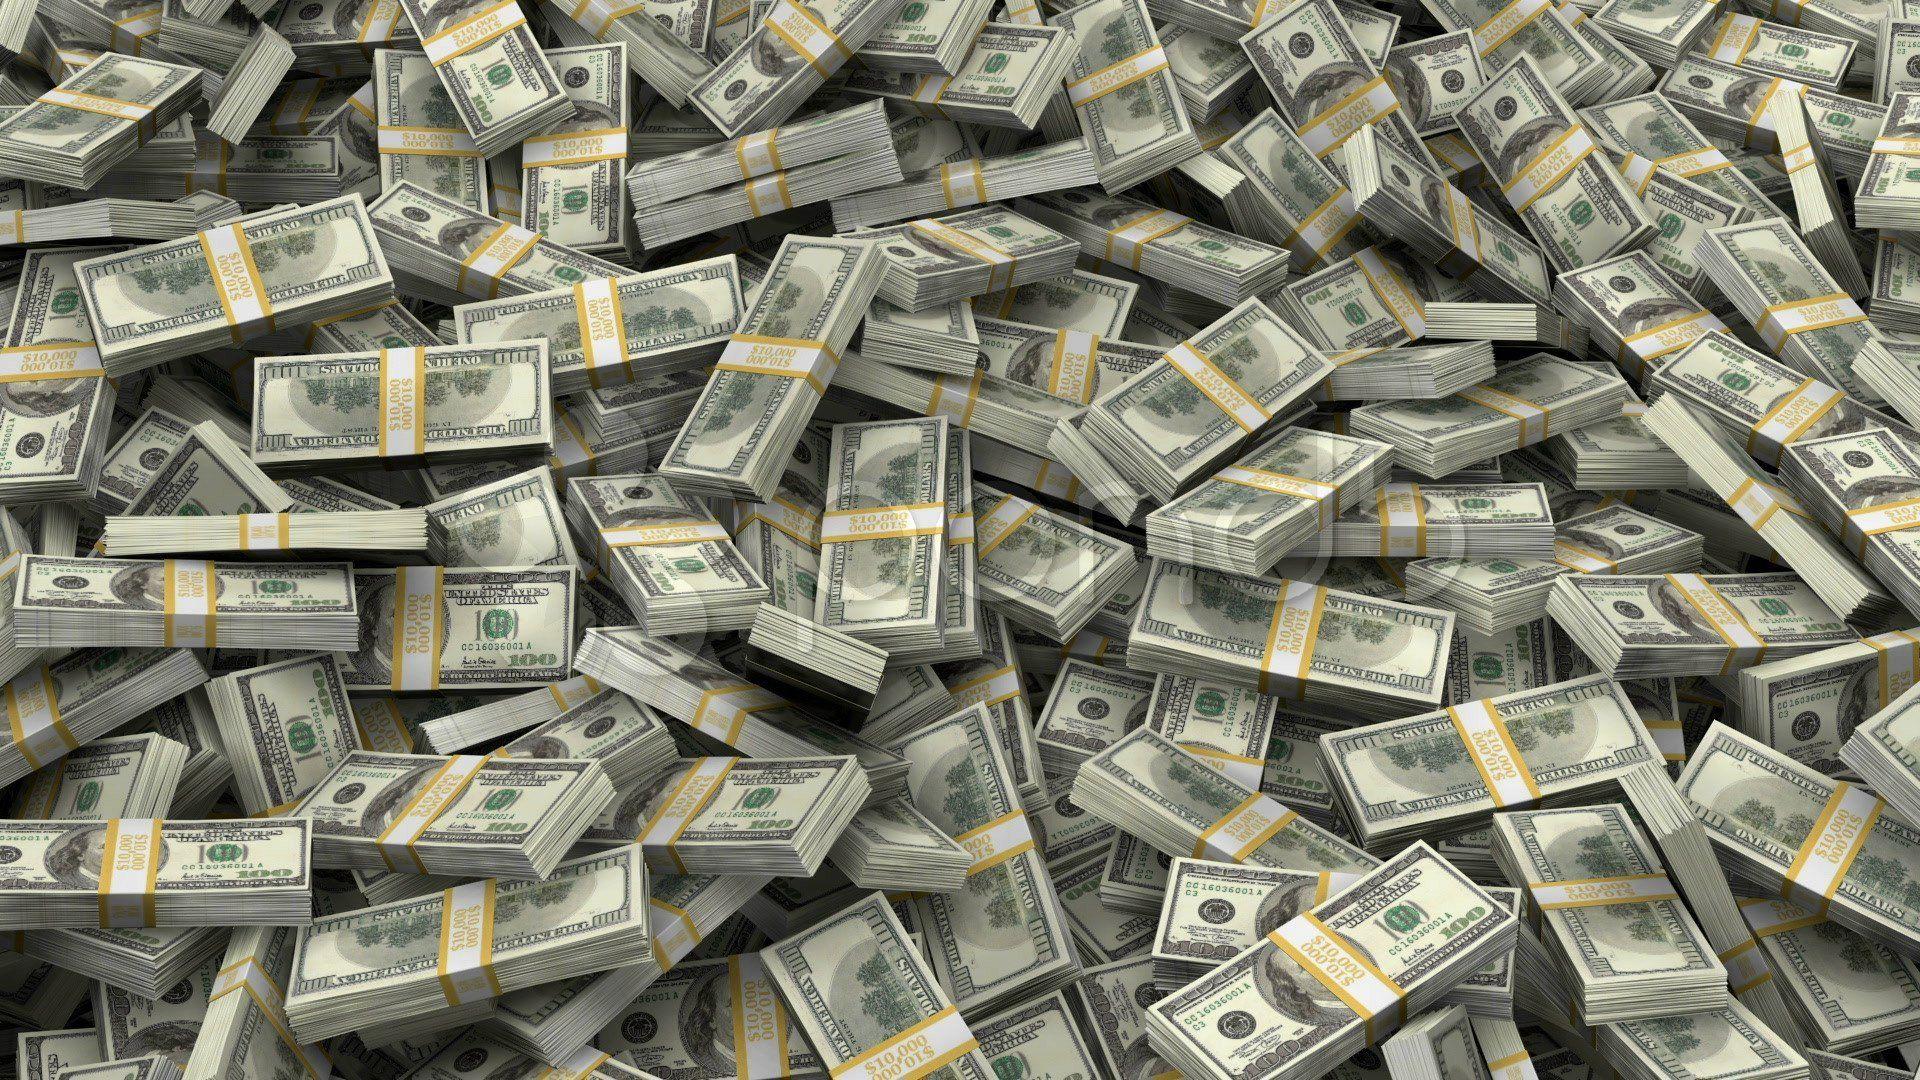 1112176-cash-money-wallpaper-1920×1080-full-hd-money